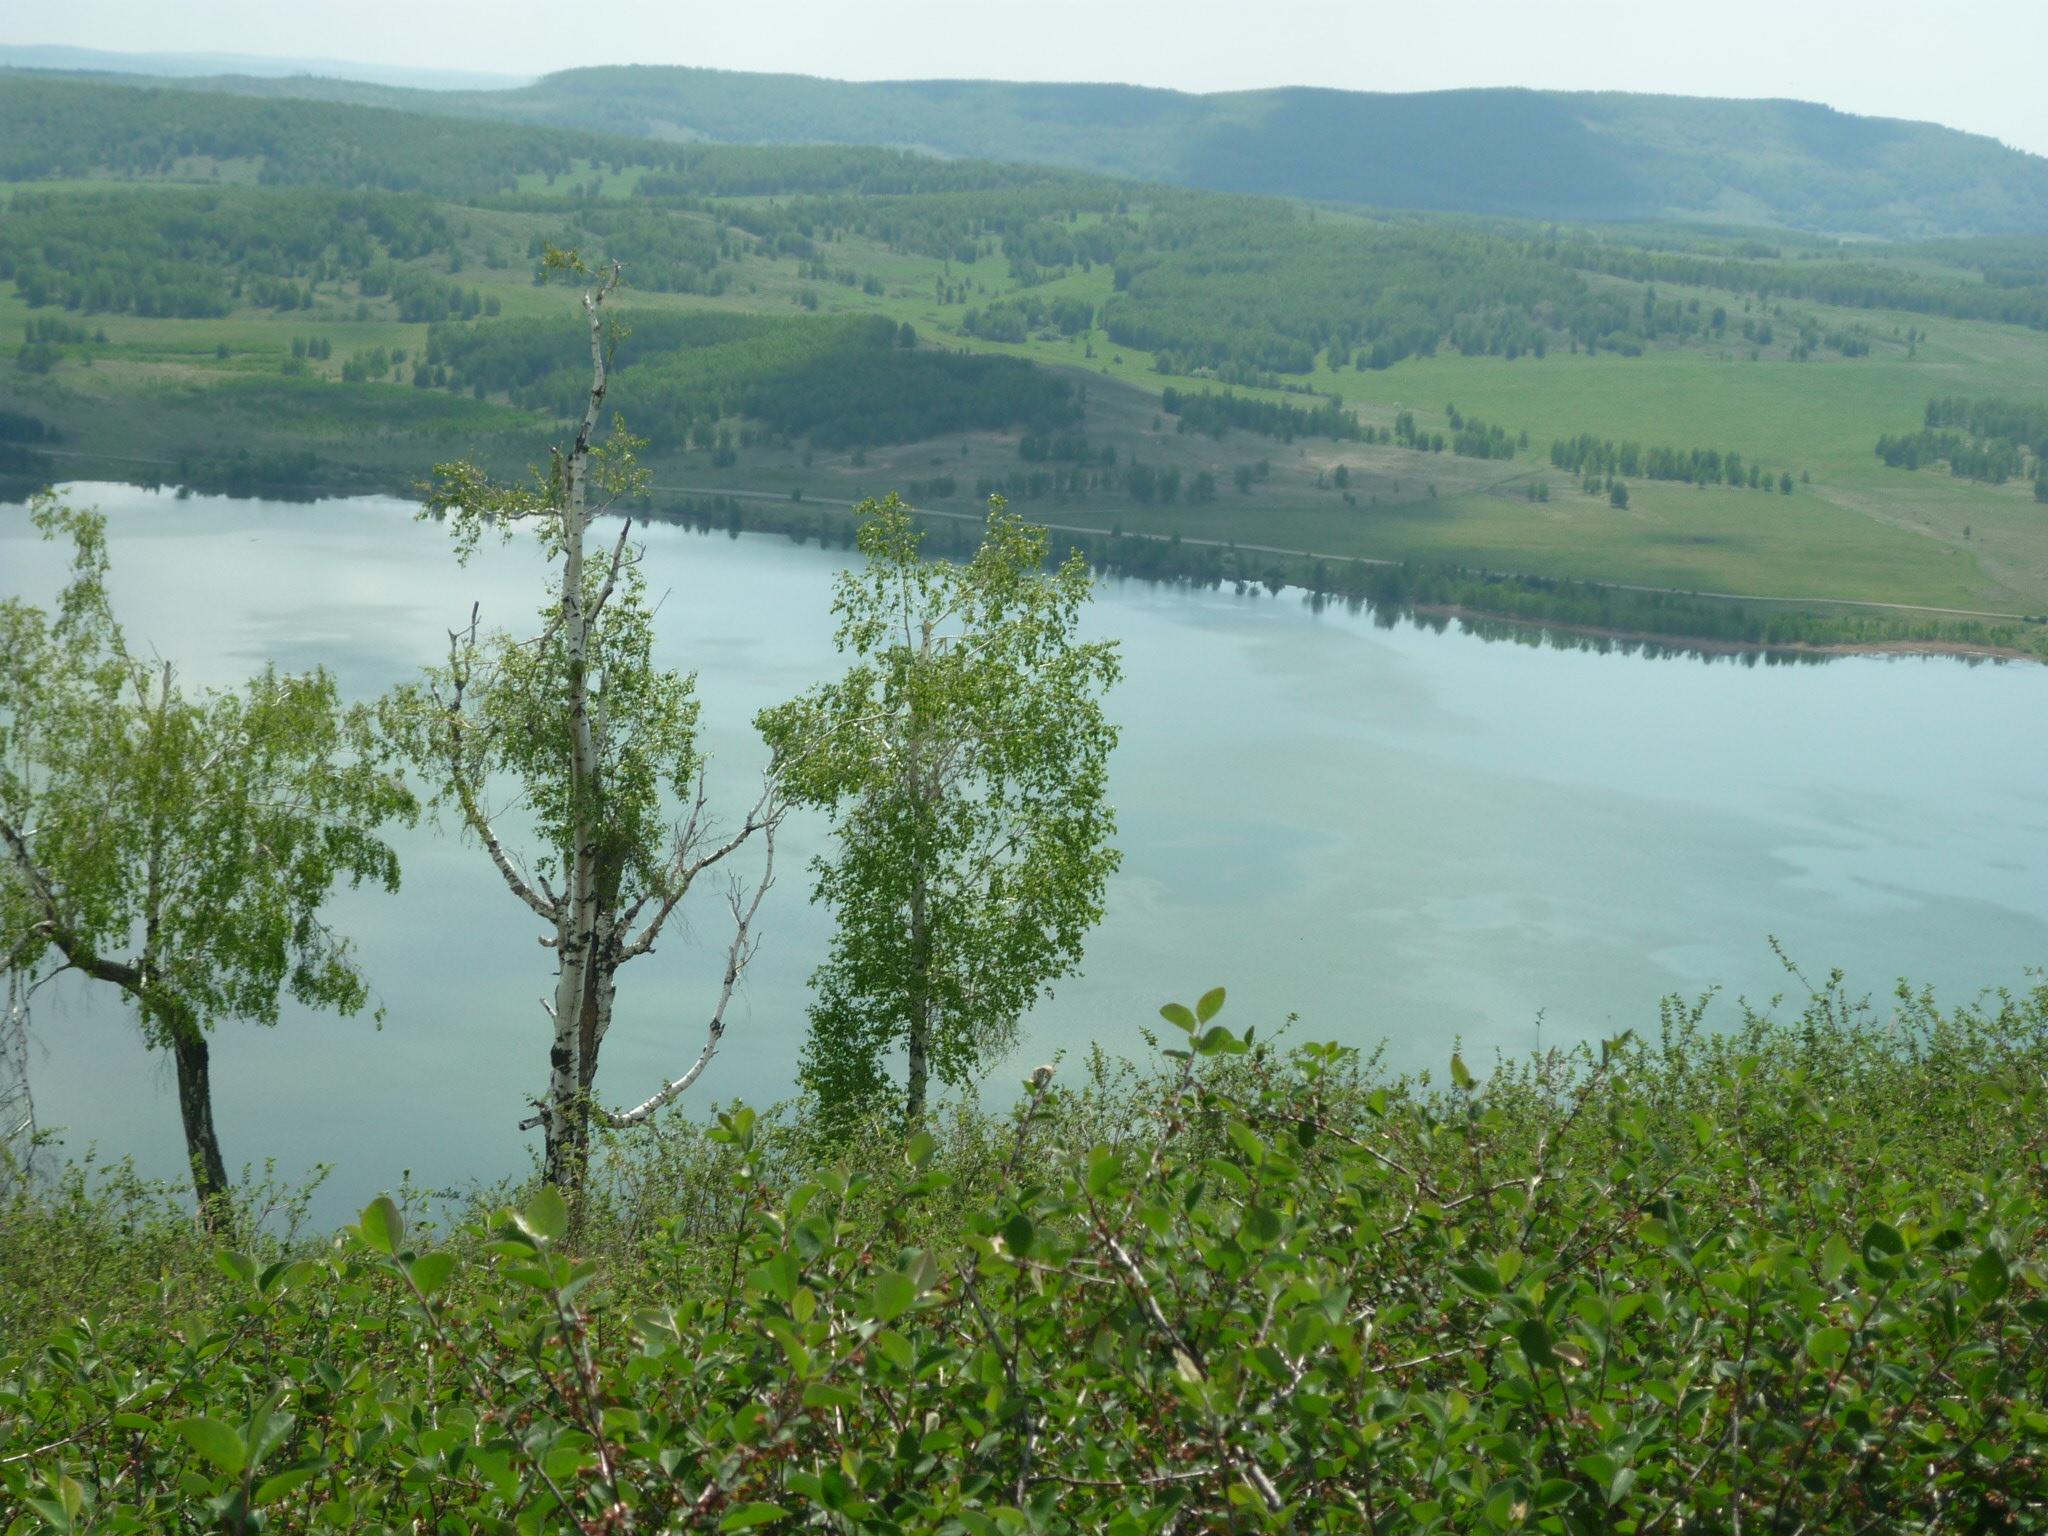 Вид на Аушкуль с горы (03.07.2015)